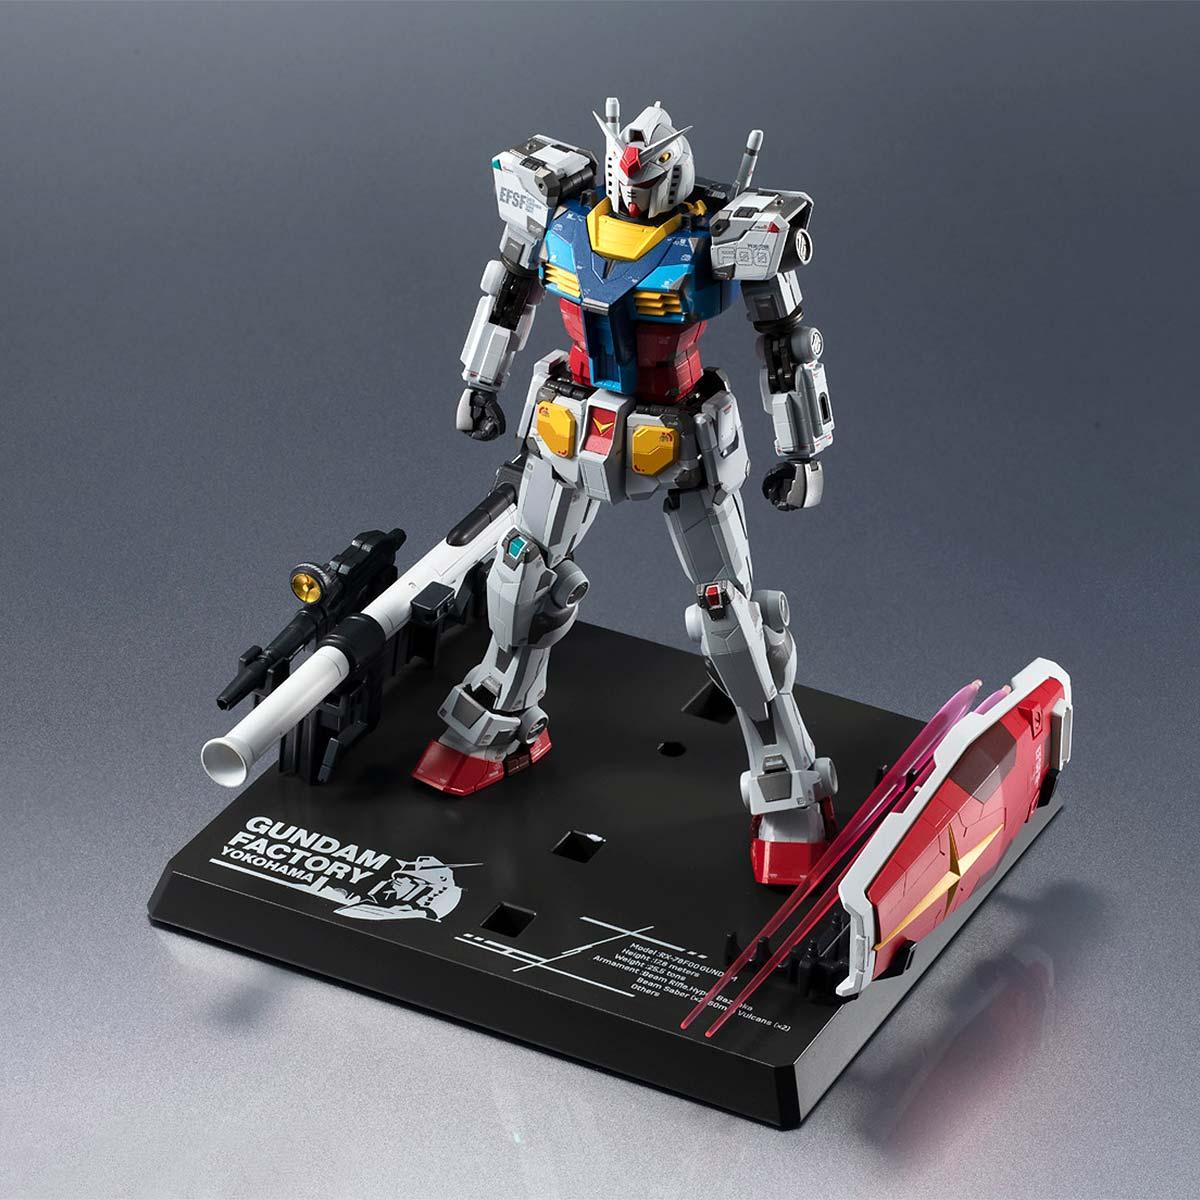 Chogokin x Gundam Factory Yokohama RX-78F00 Gundam